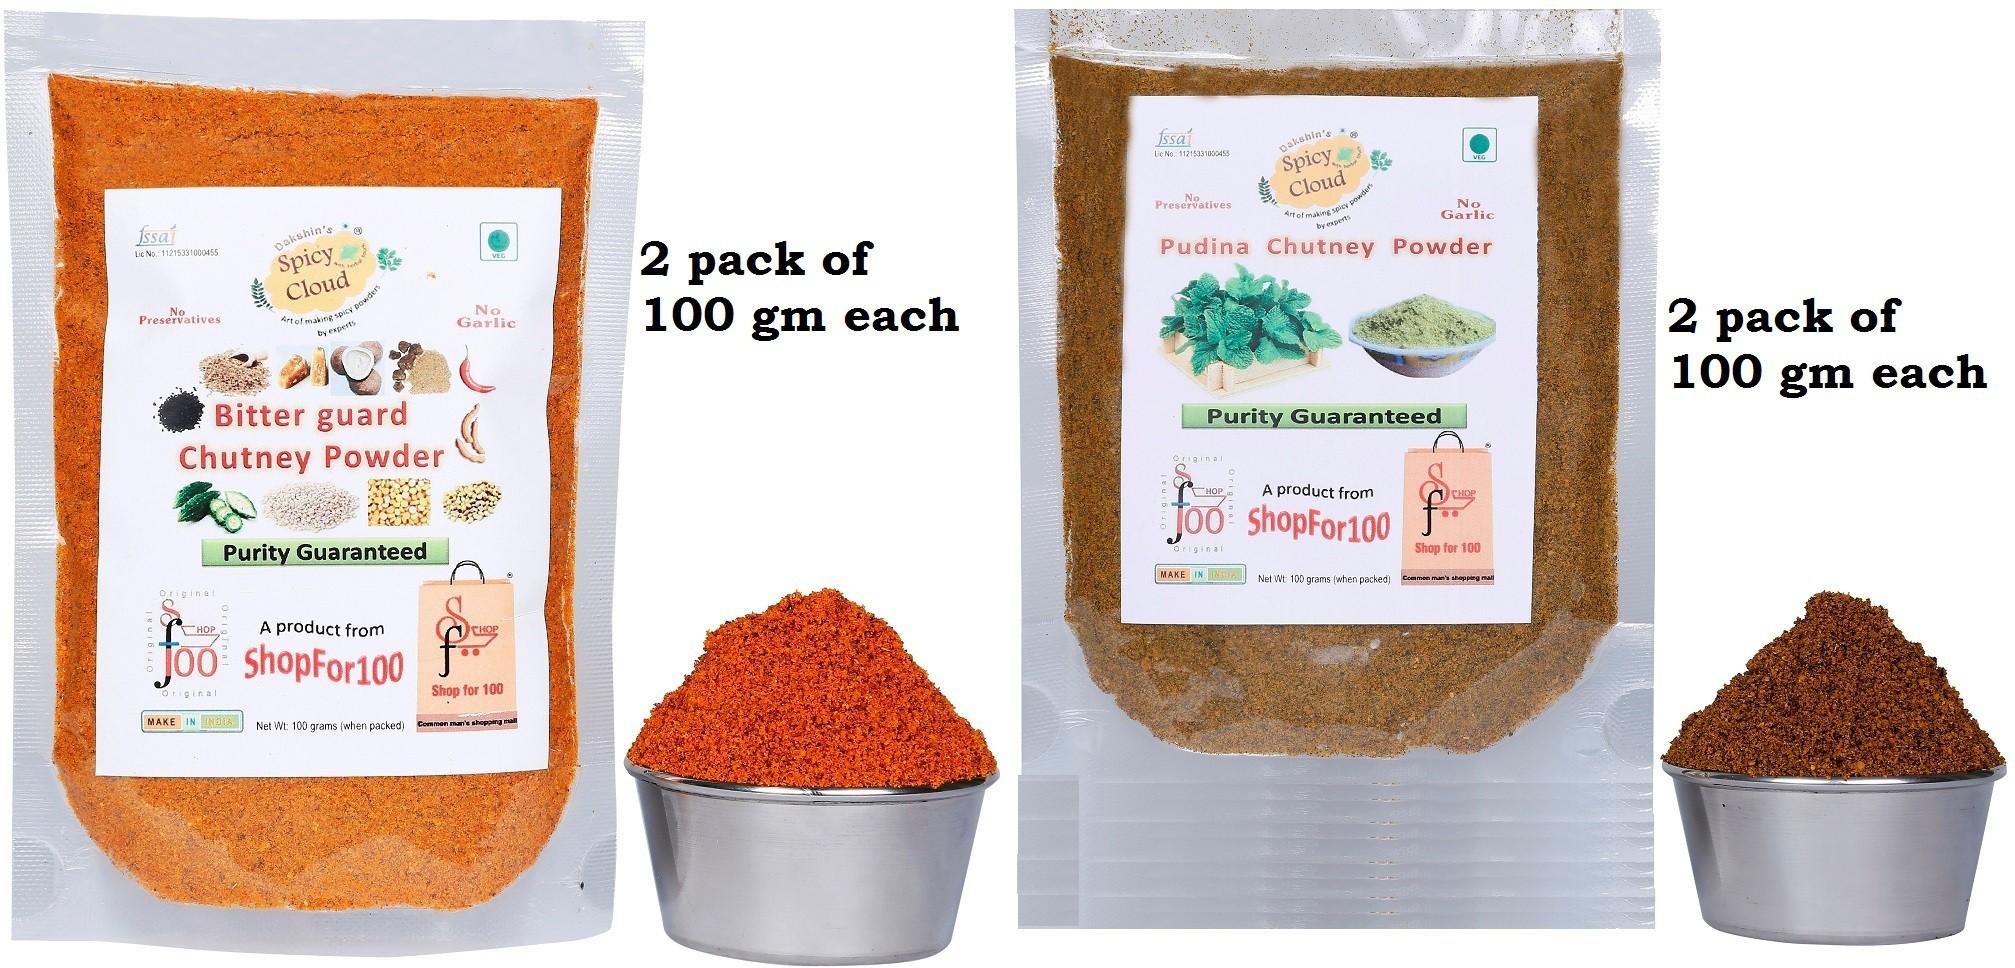 Dakshin's Spicy Cloud Chutney Powders Combo Pack: Bitter guard & Pudina Chutney Powder